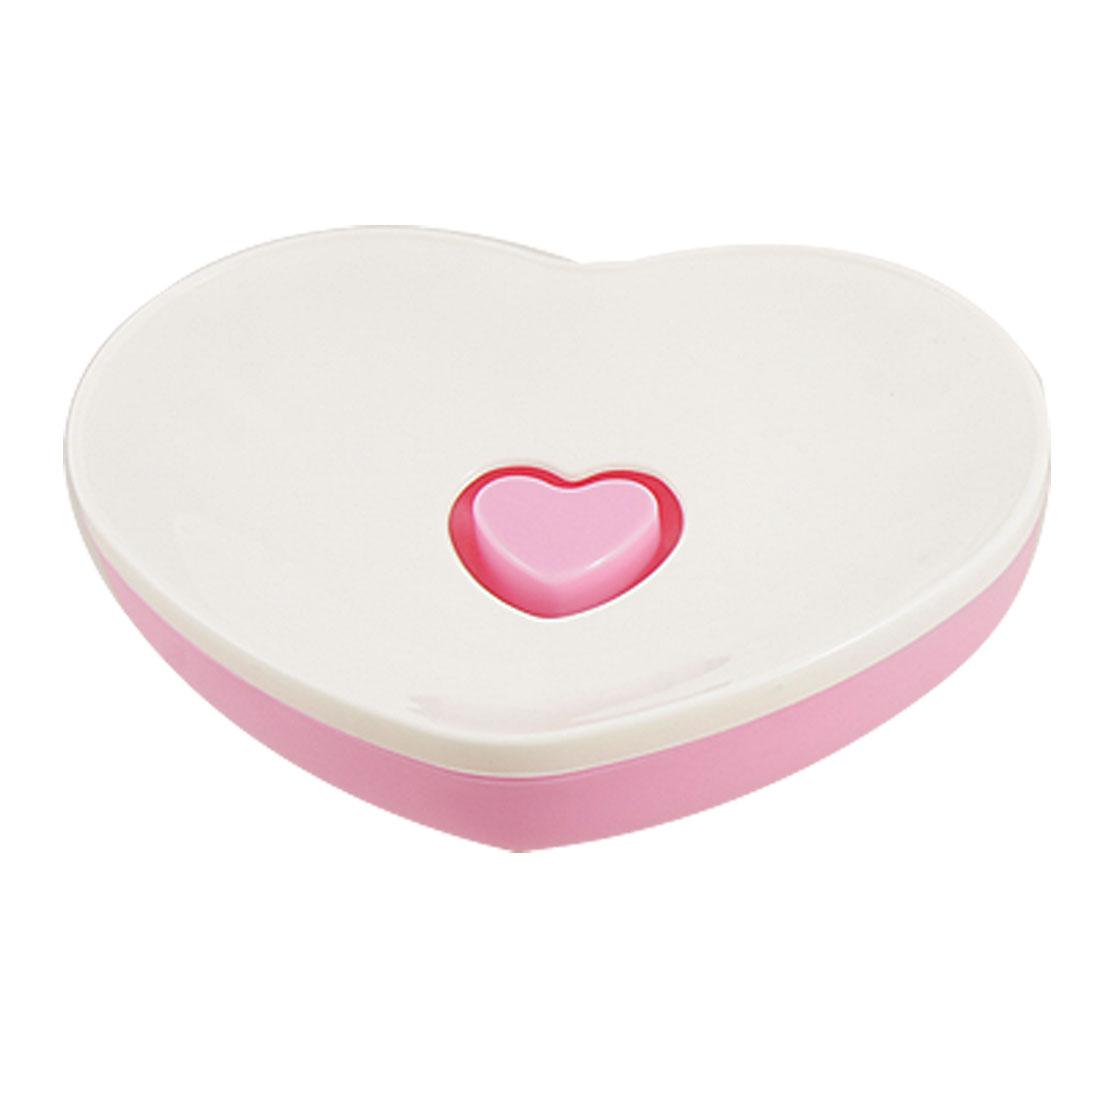 Bathroom Pink White Plastic Heart Shape Soap Dish Holder